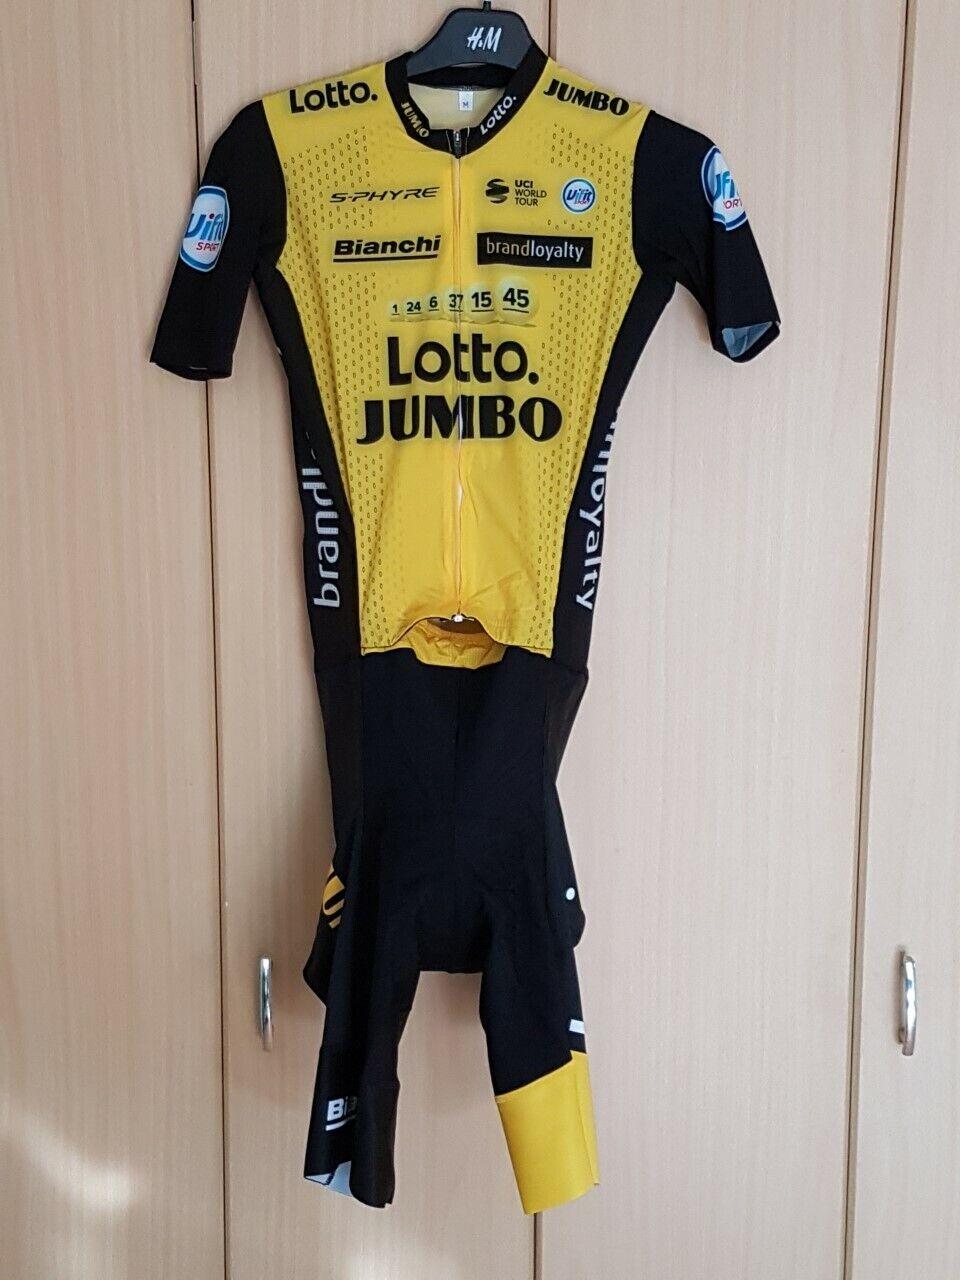 Oorspronkelijke Shimano Lotto Jumbo 2018 Sprintanzug Stef Clemannent (S)